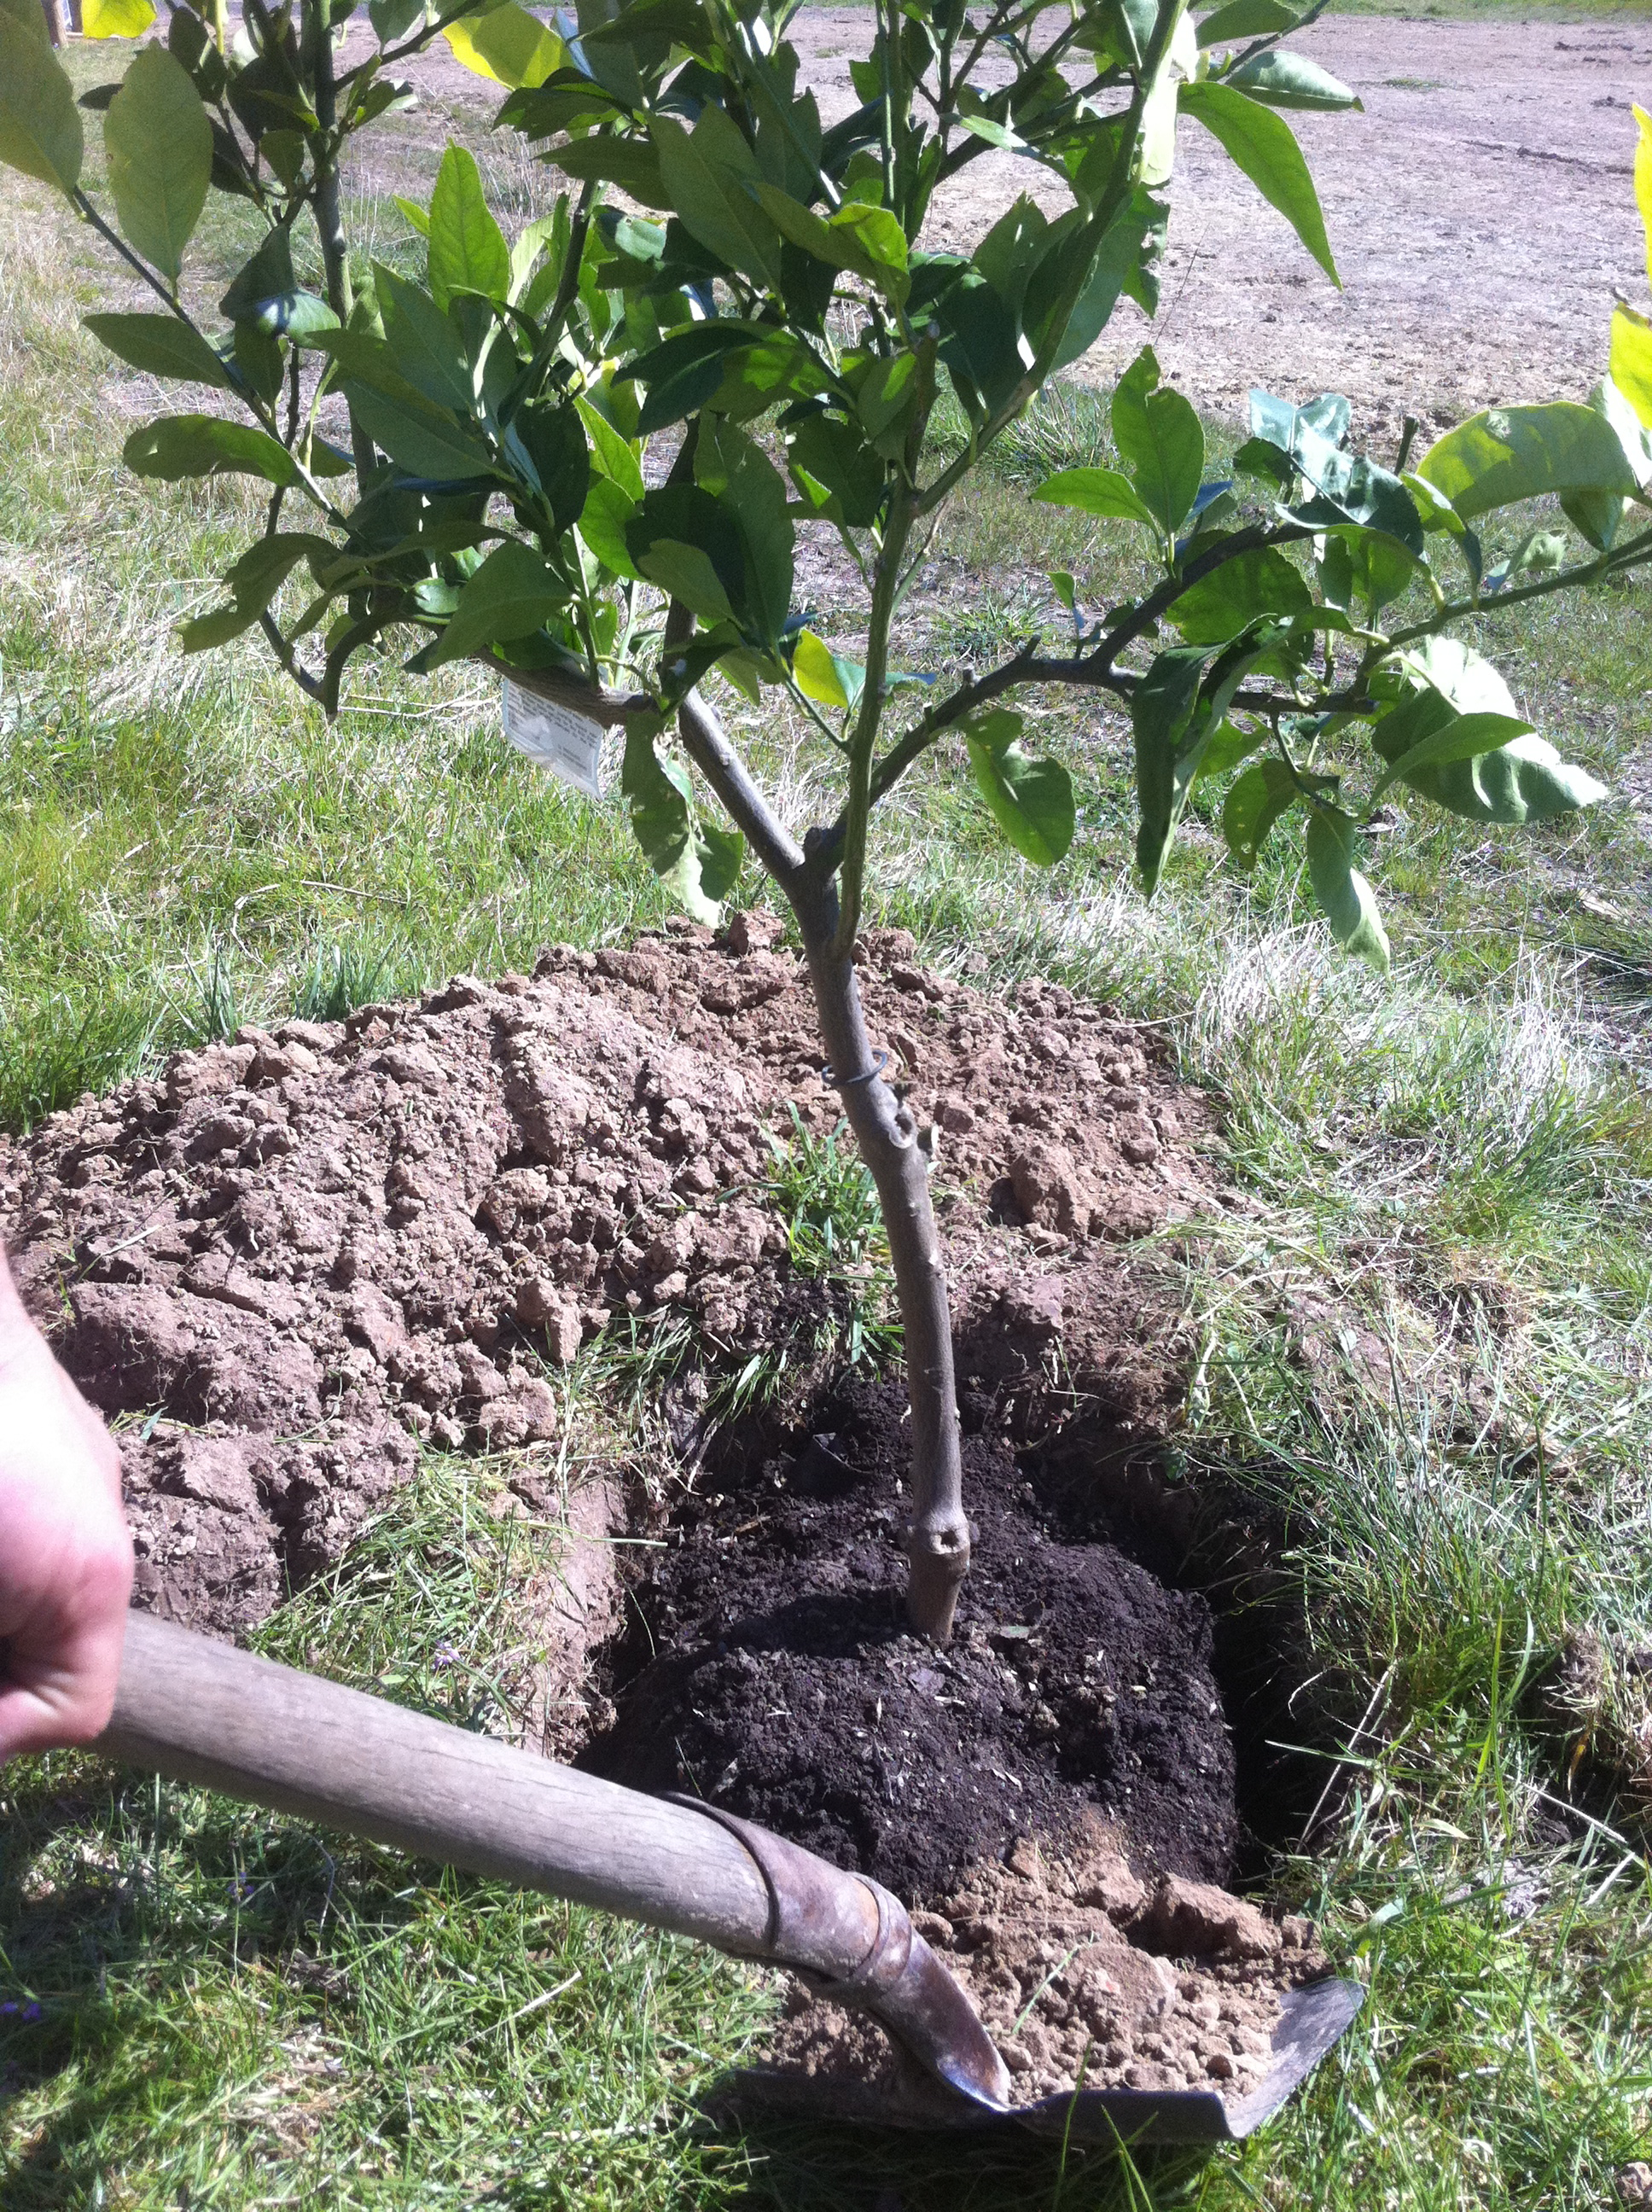 Fruit tree transplant life on the land for When to transplant lemon tree seedlings